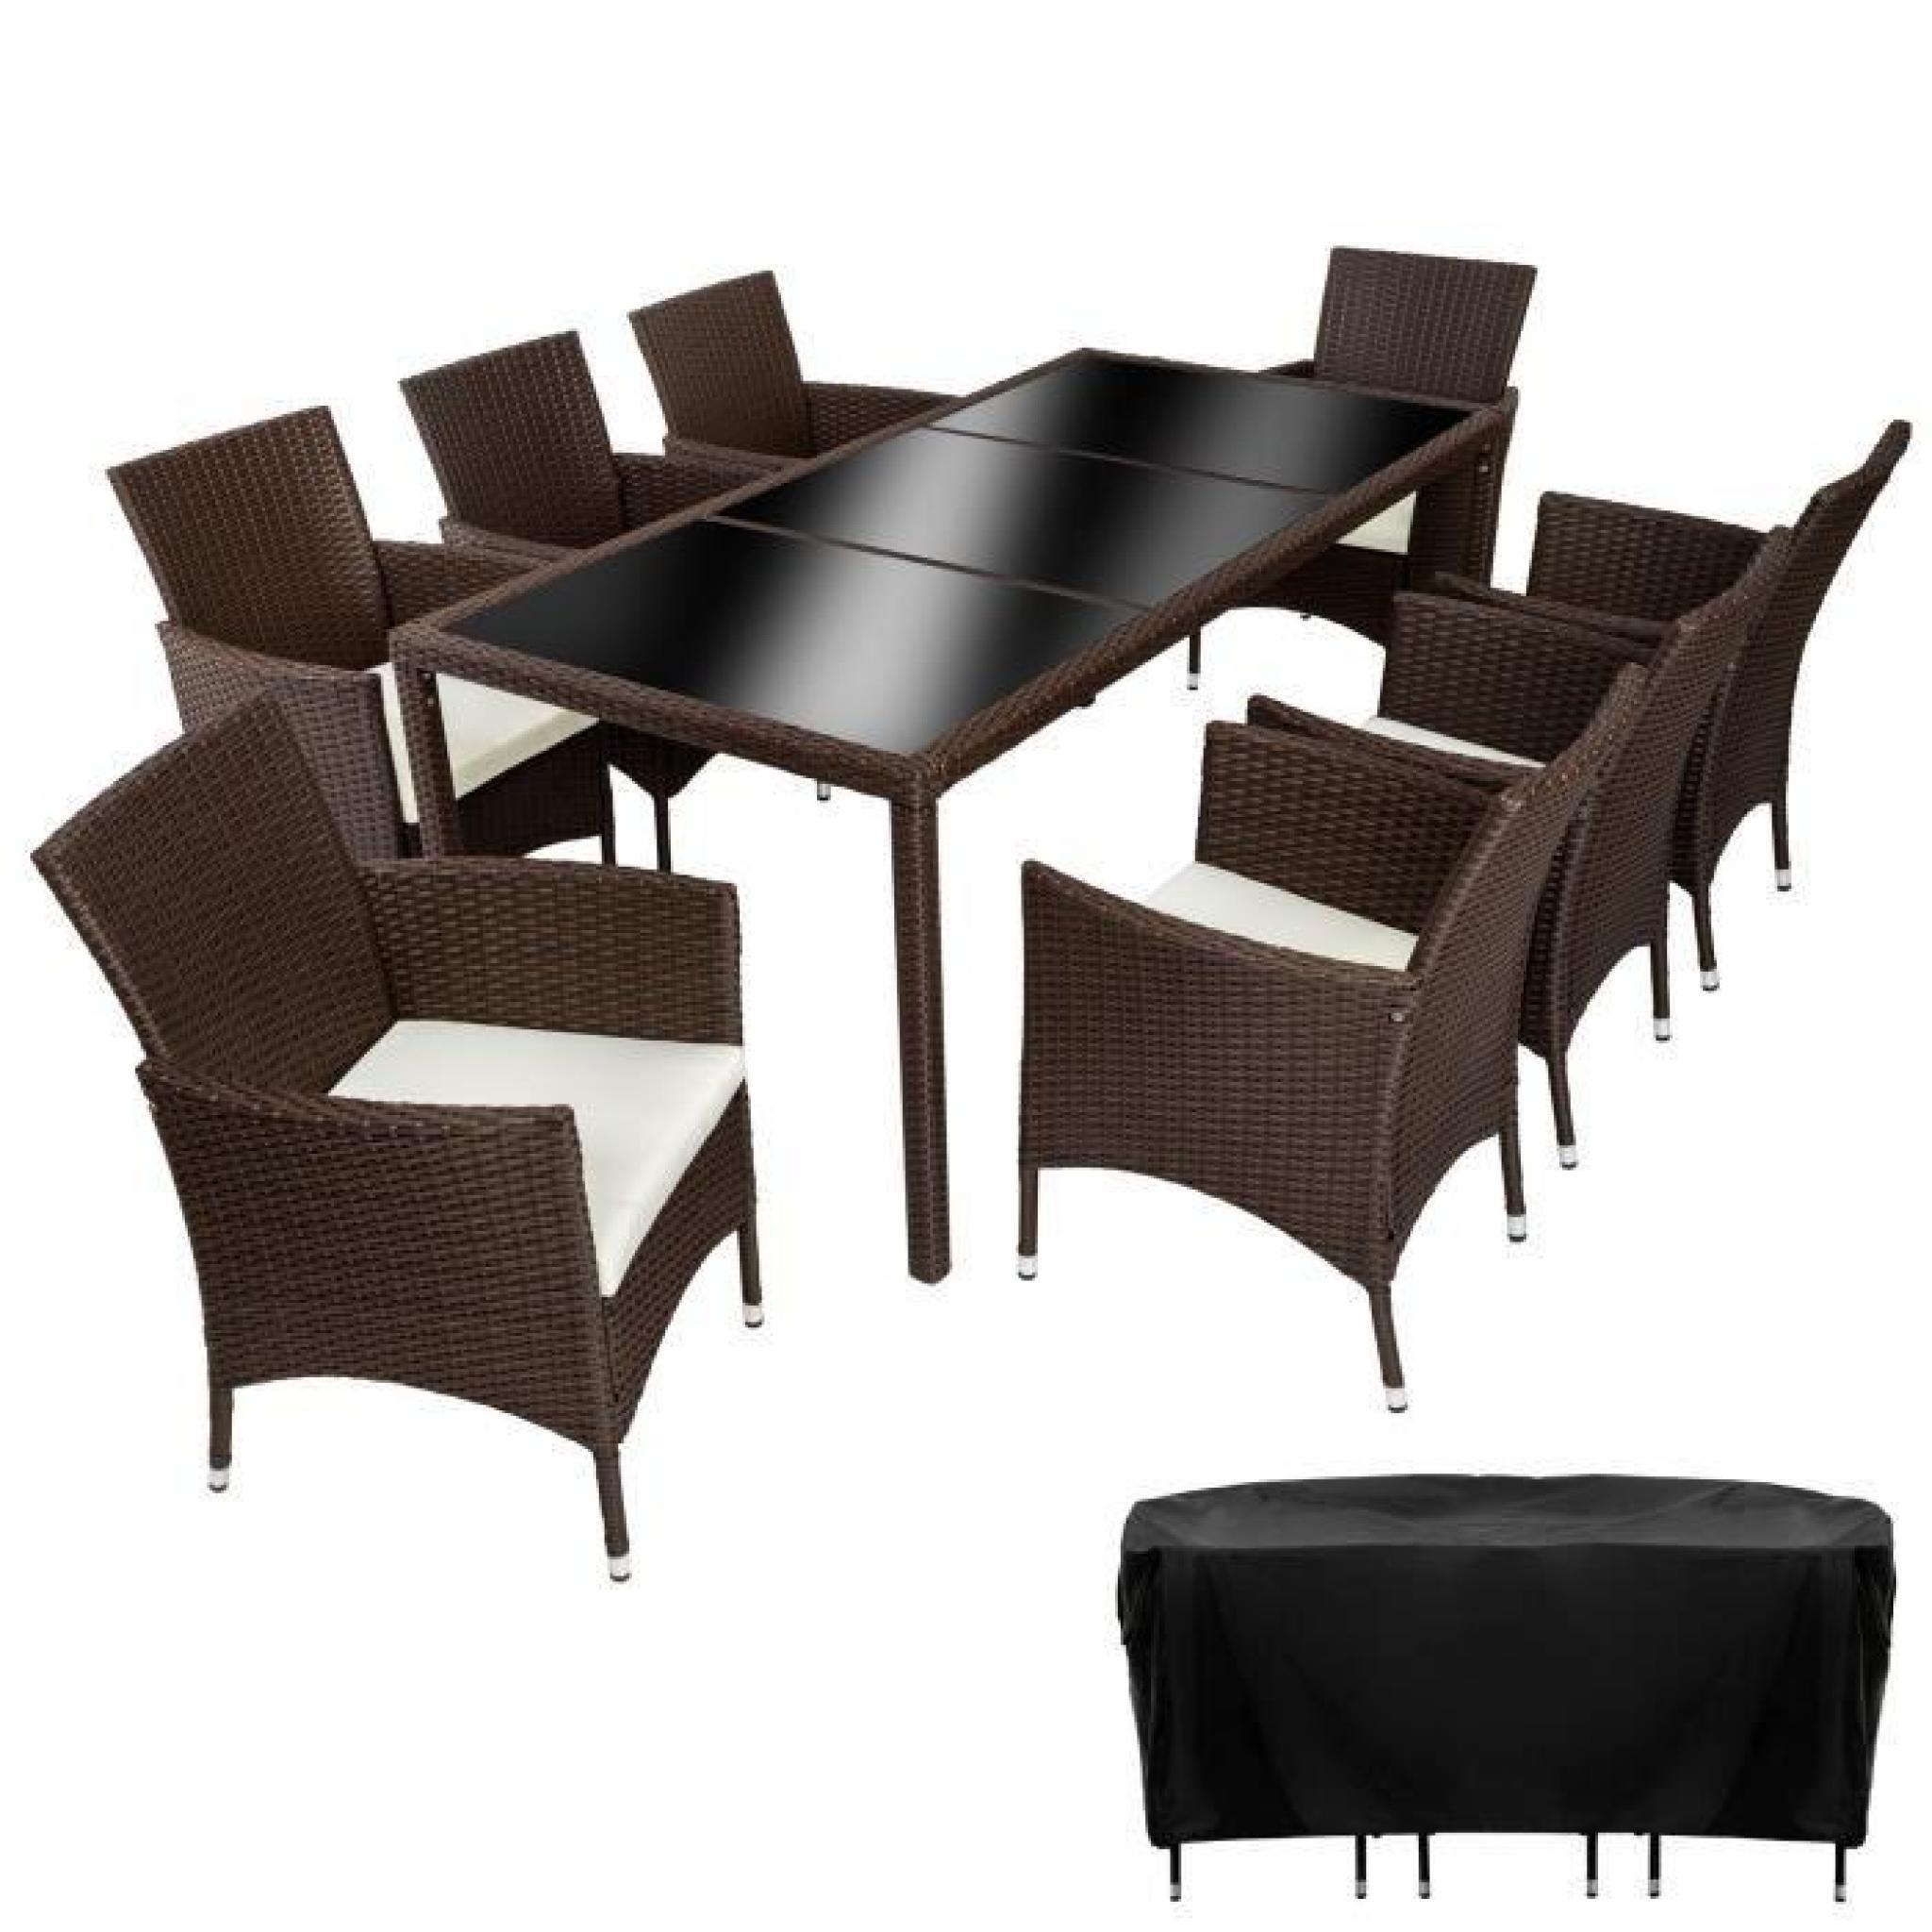 salon-de-jardin-valencia-8-chaises-et-1-table-en-1 Luxe De Salon De Jardin Allibert California Concept